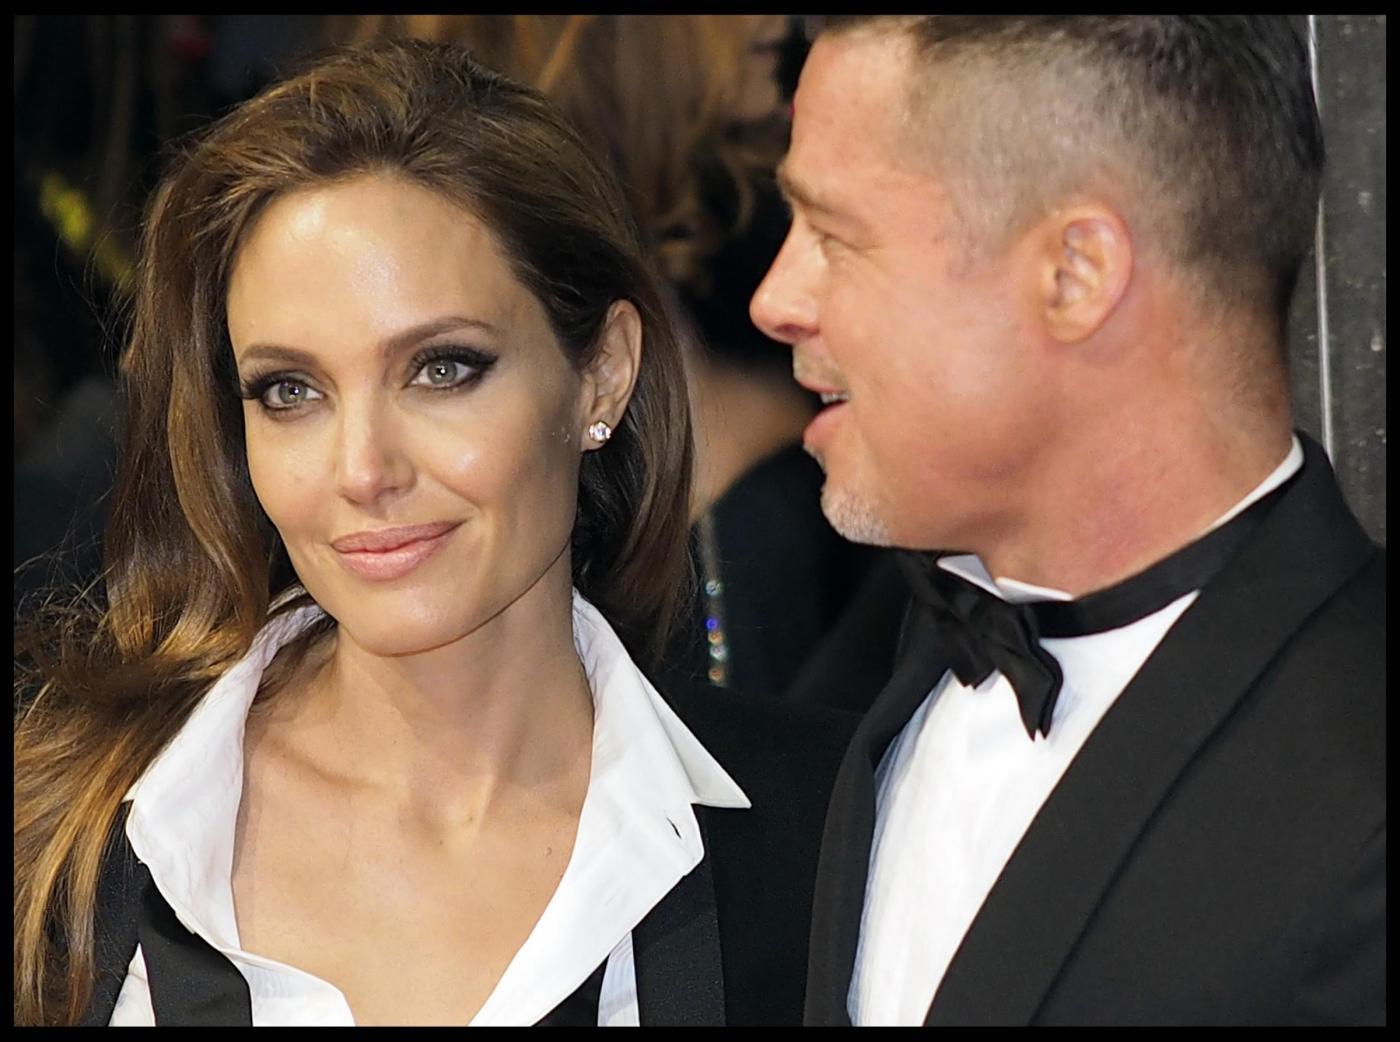 Bafta 2014, Brad Pitt e Angelina Jolie in doppio smoking03